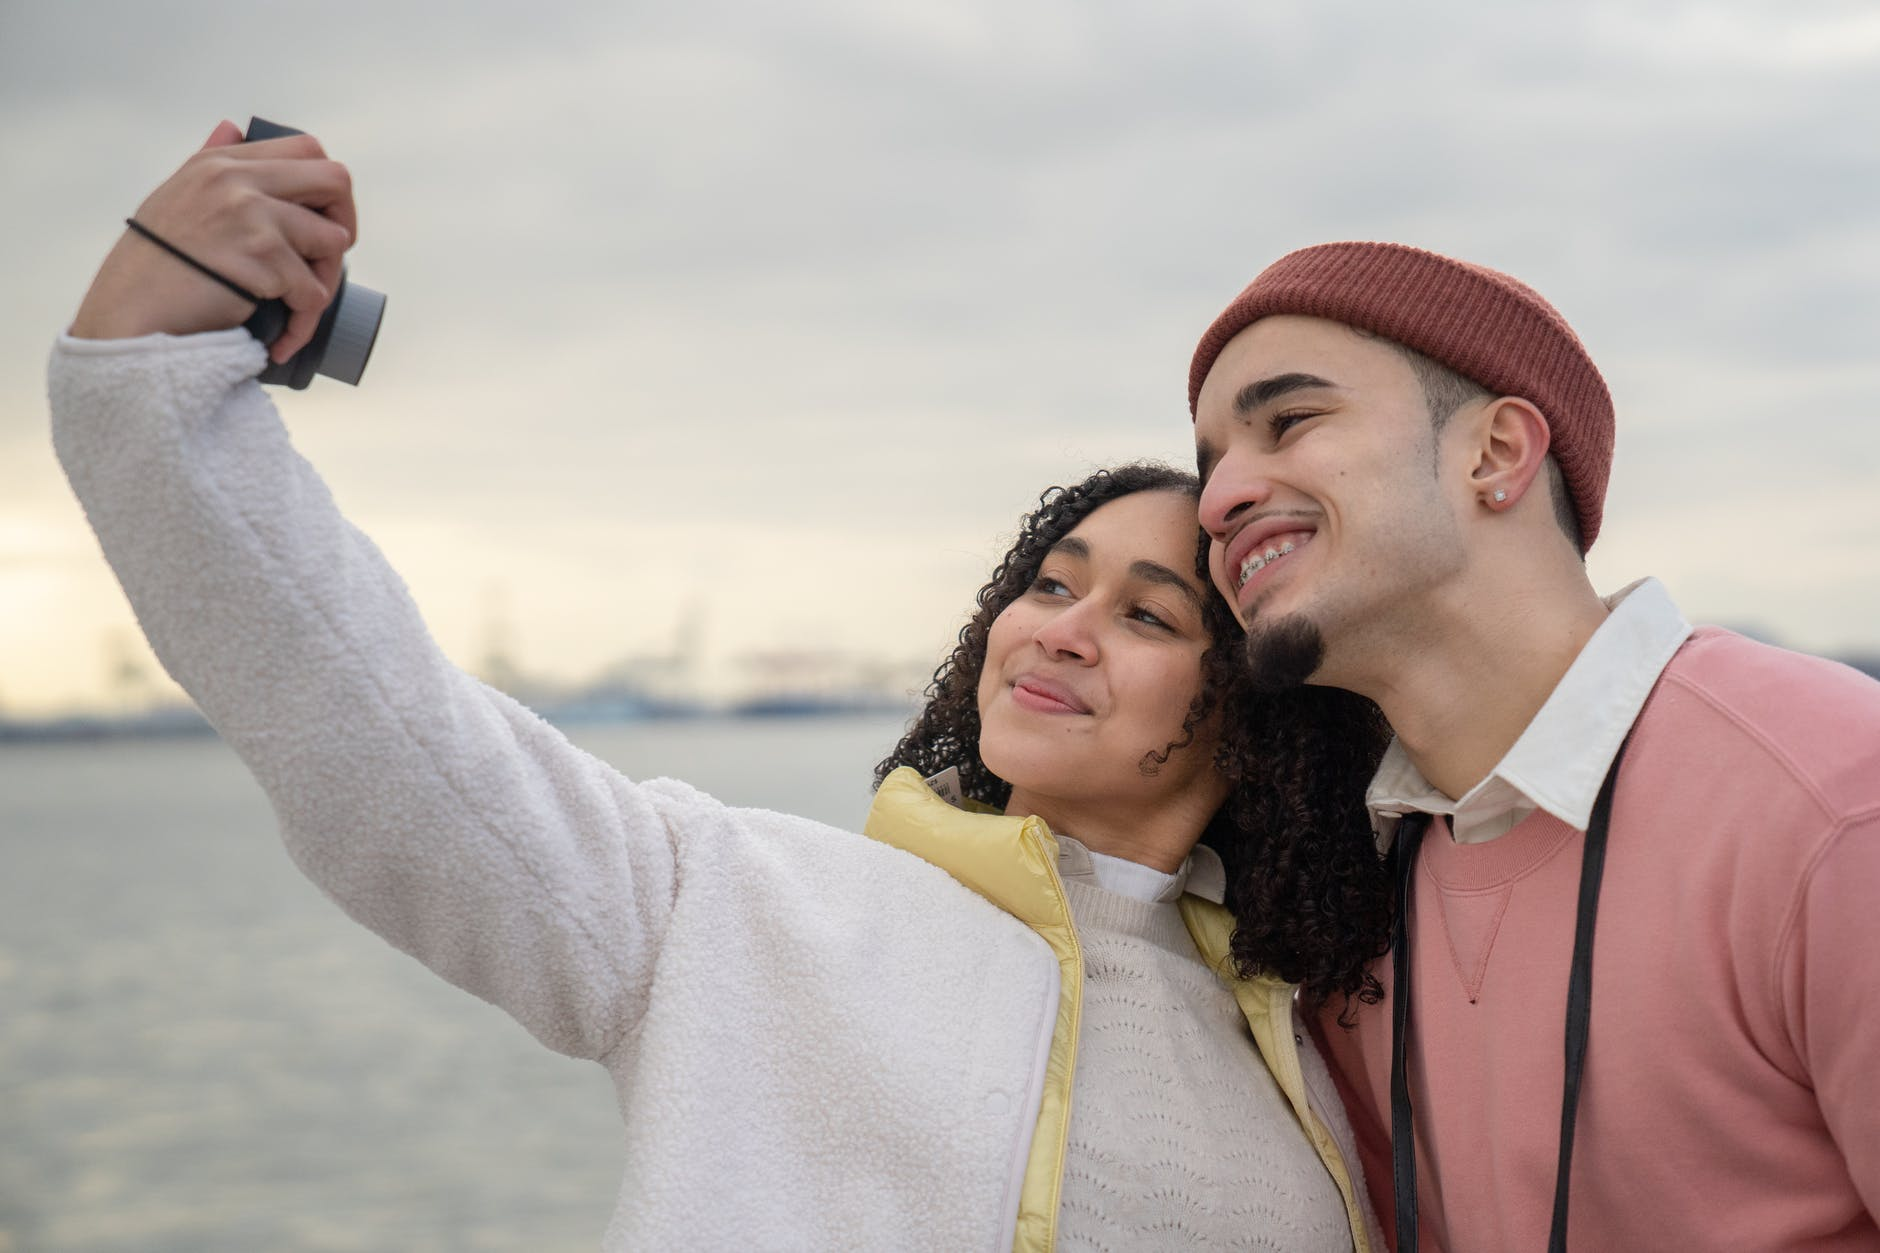 hispanic couple taking self photo on film camera near river